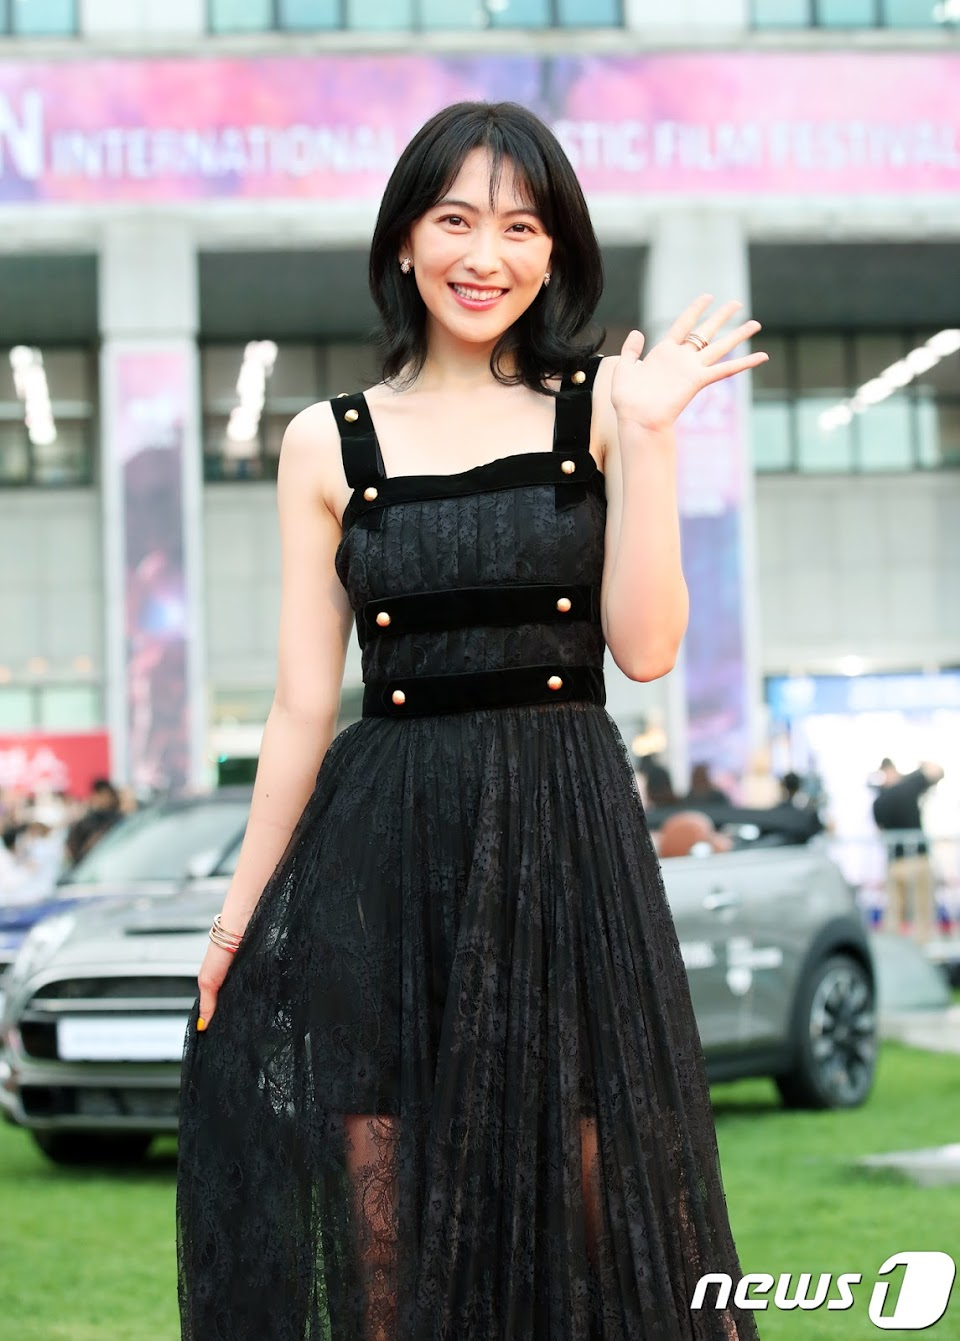 kang jiyoung weight gain 6